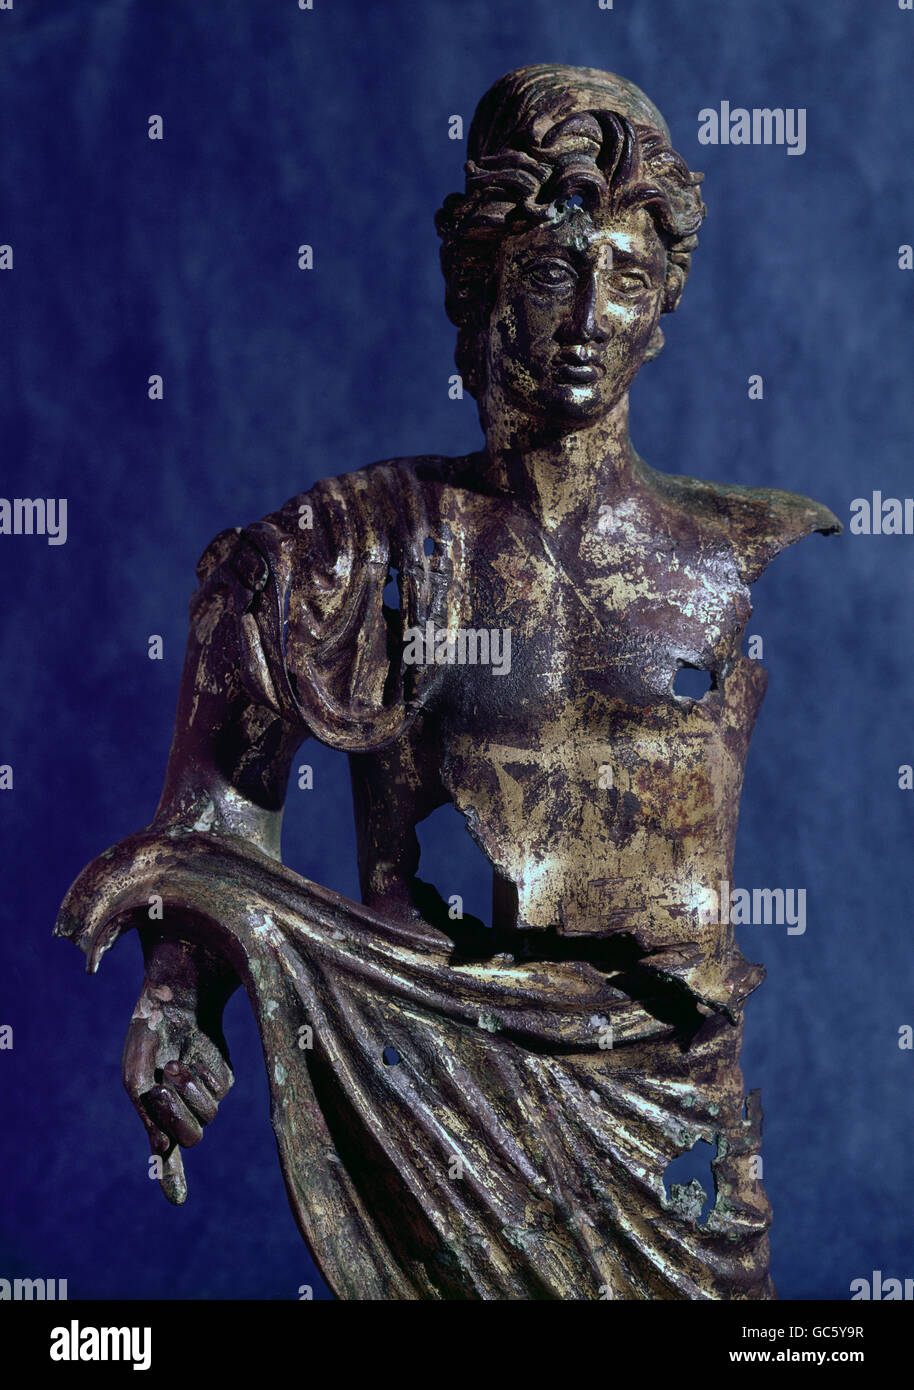 fine arts, ancient world, Roman Empire, sculpture, bronze genius, gold-plated, sculpture, Augsburg, 2th/3th century - Stock Image